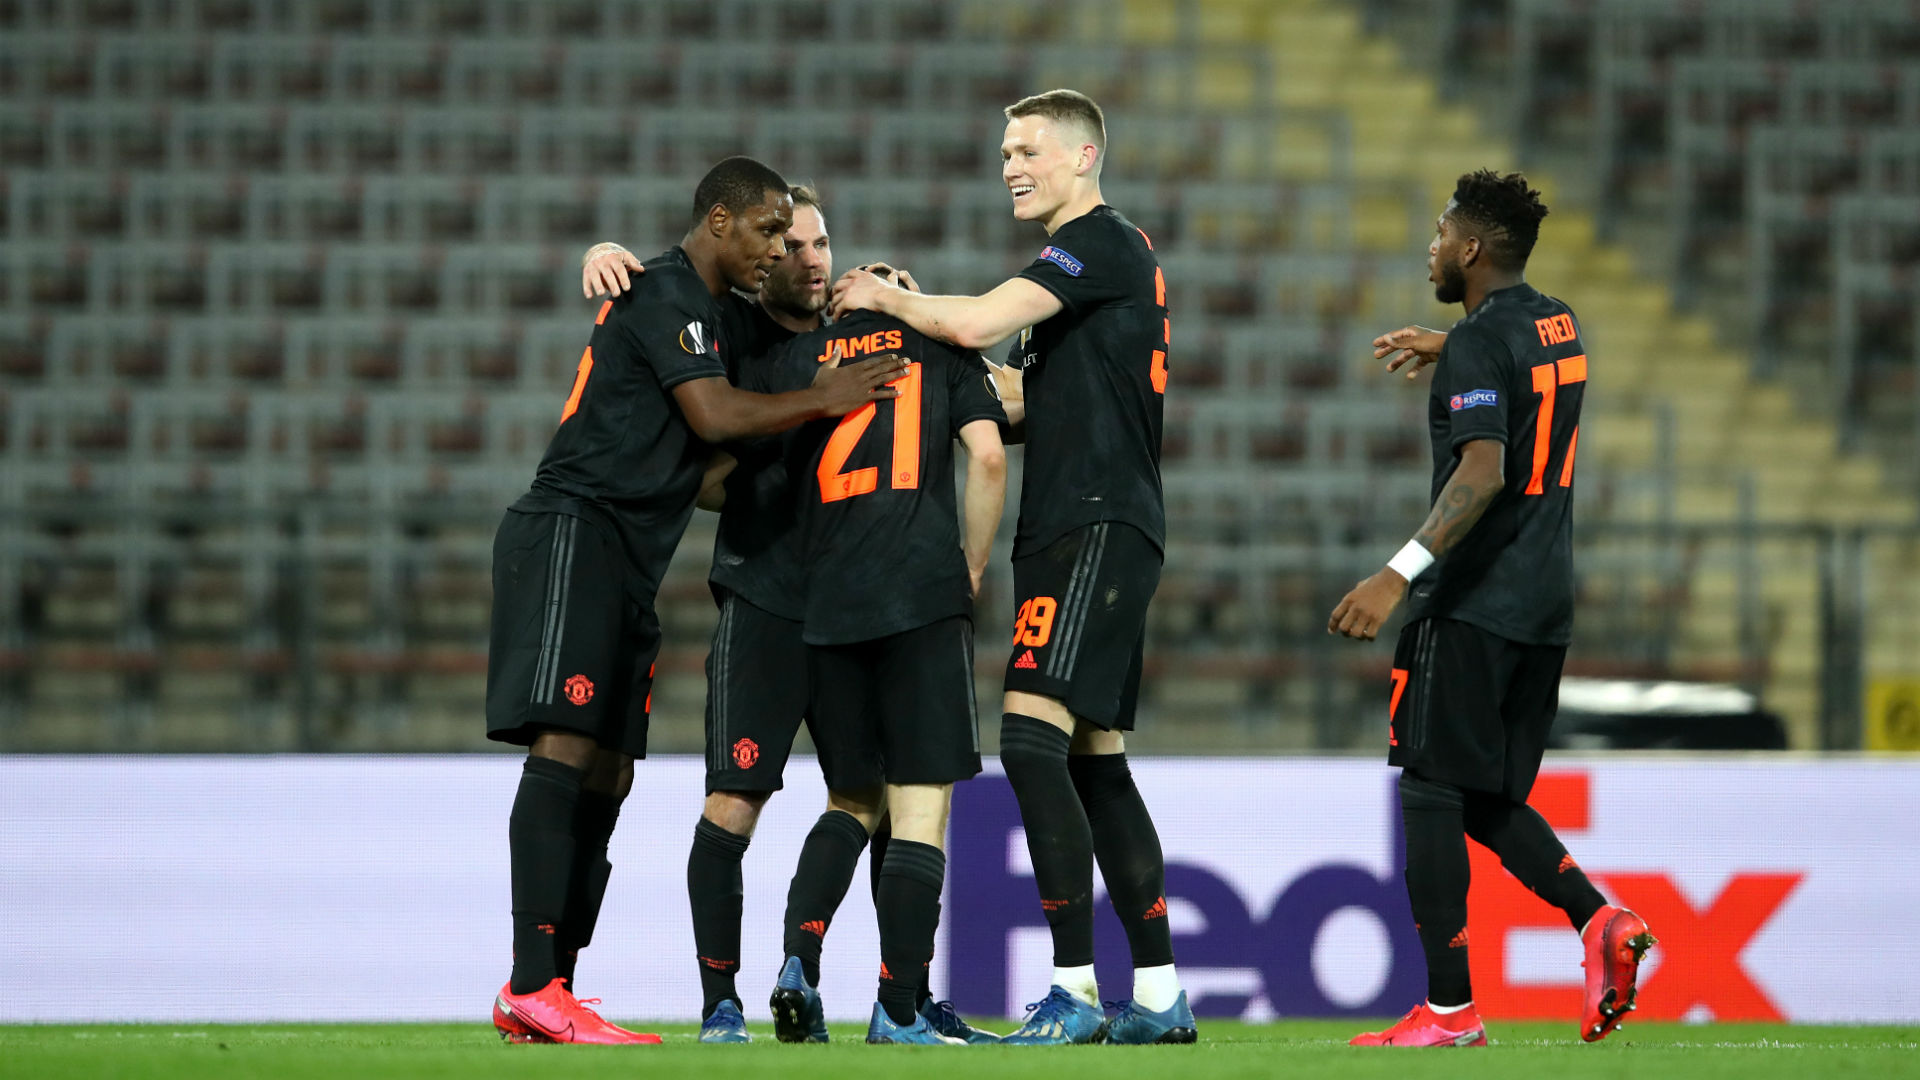 Lask V Manchester United Match Report 12 03 2020 Uefa Europa League Goal Com